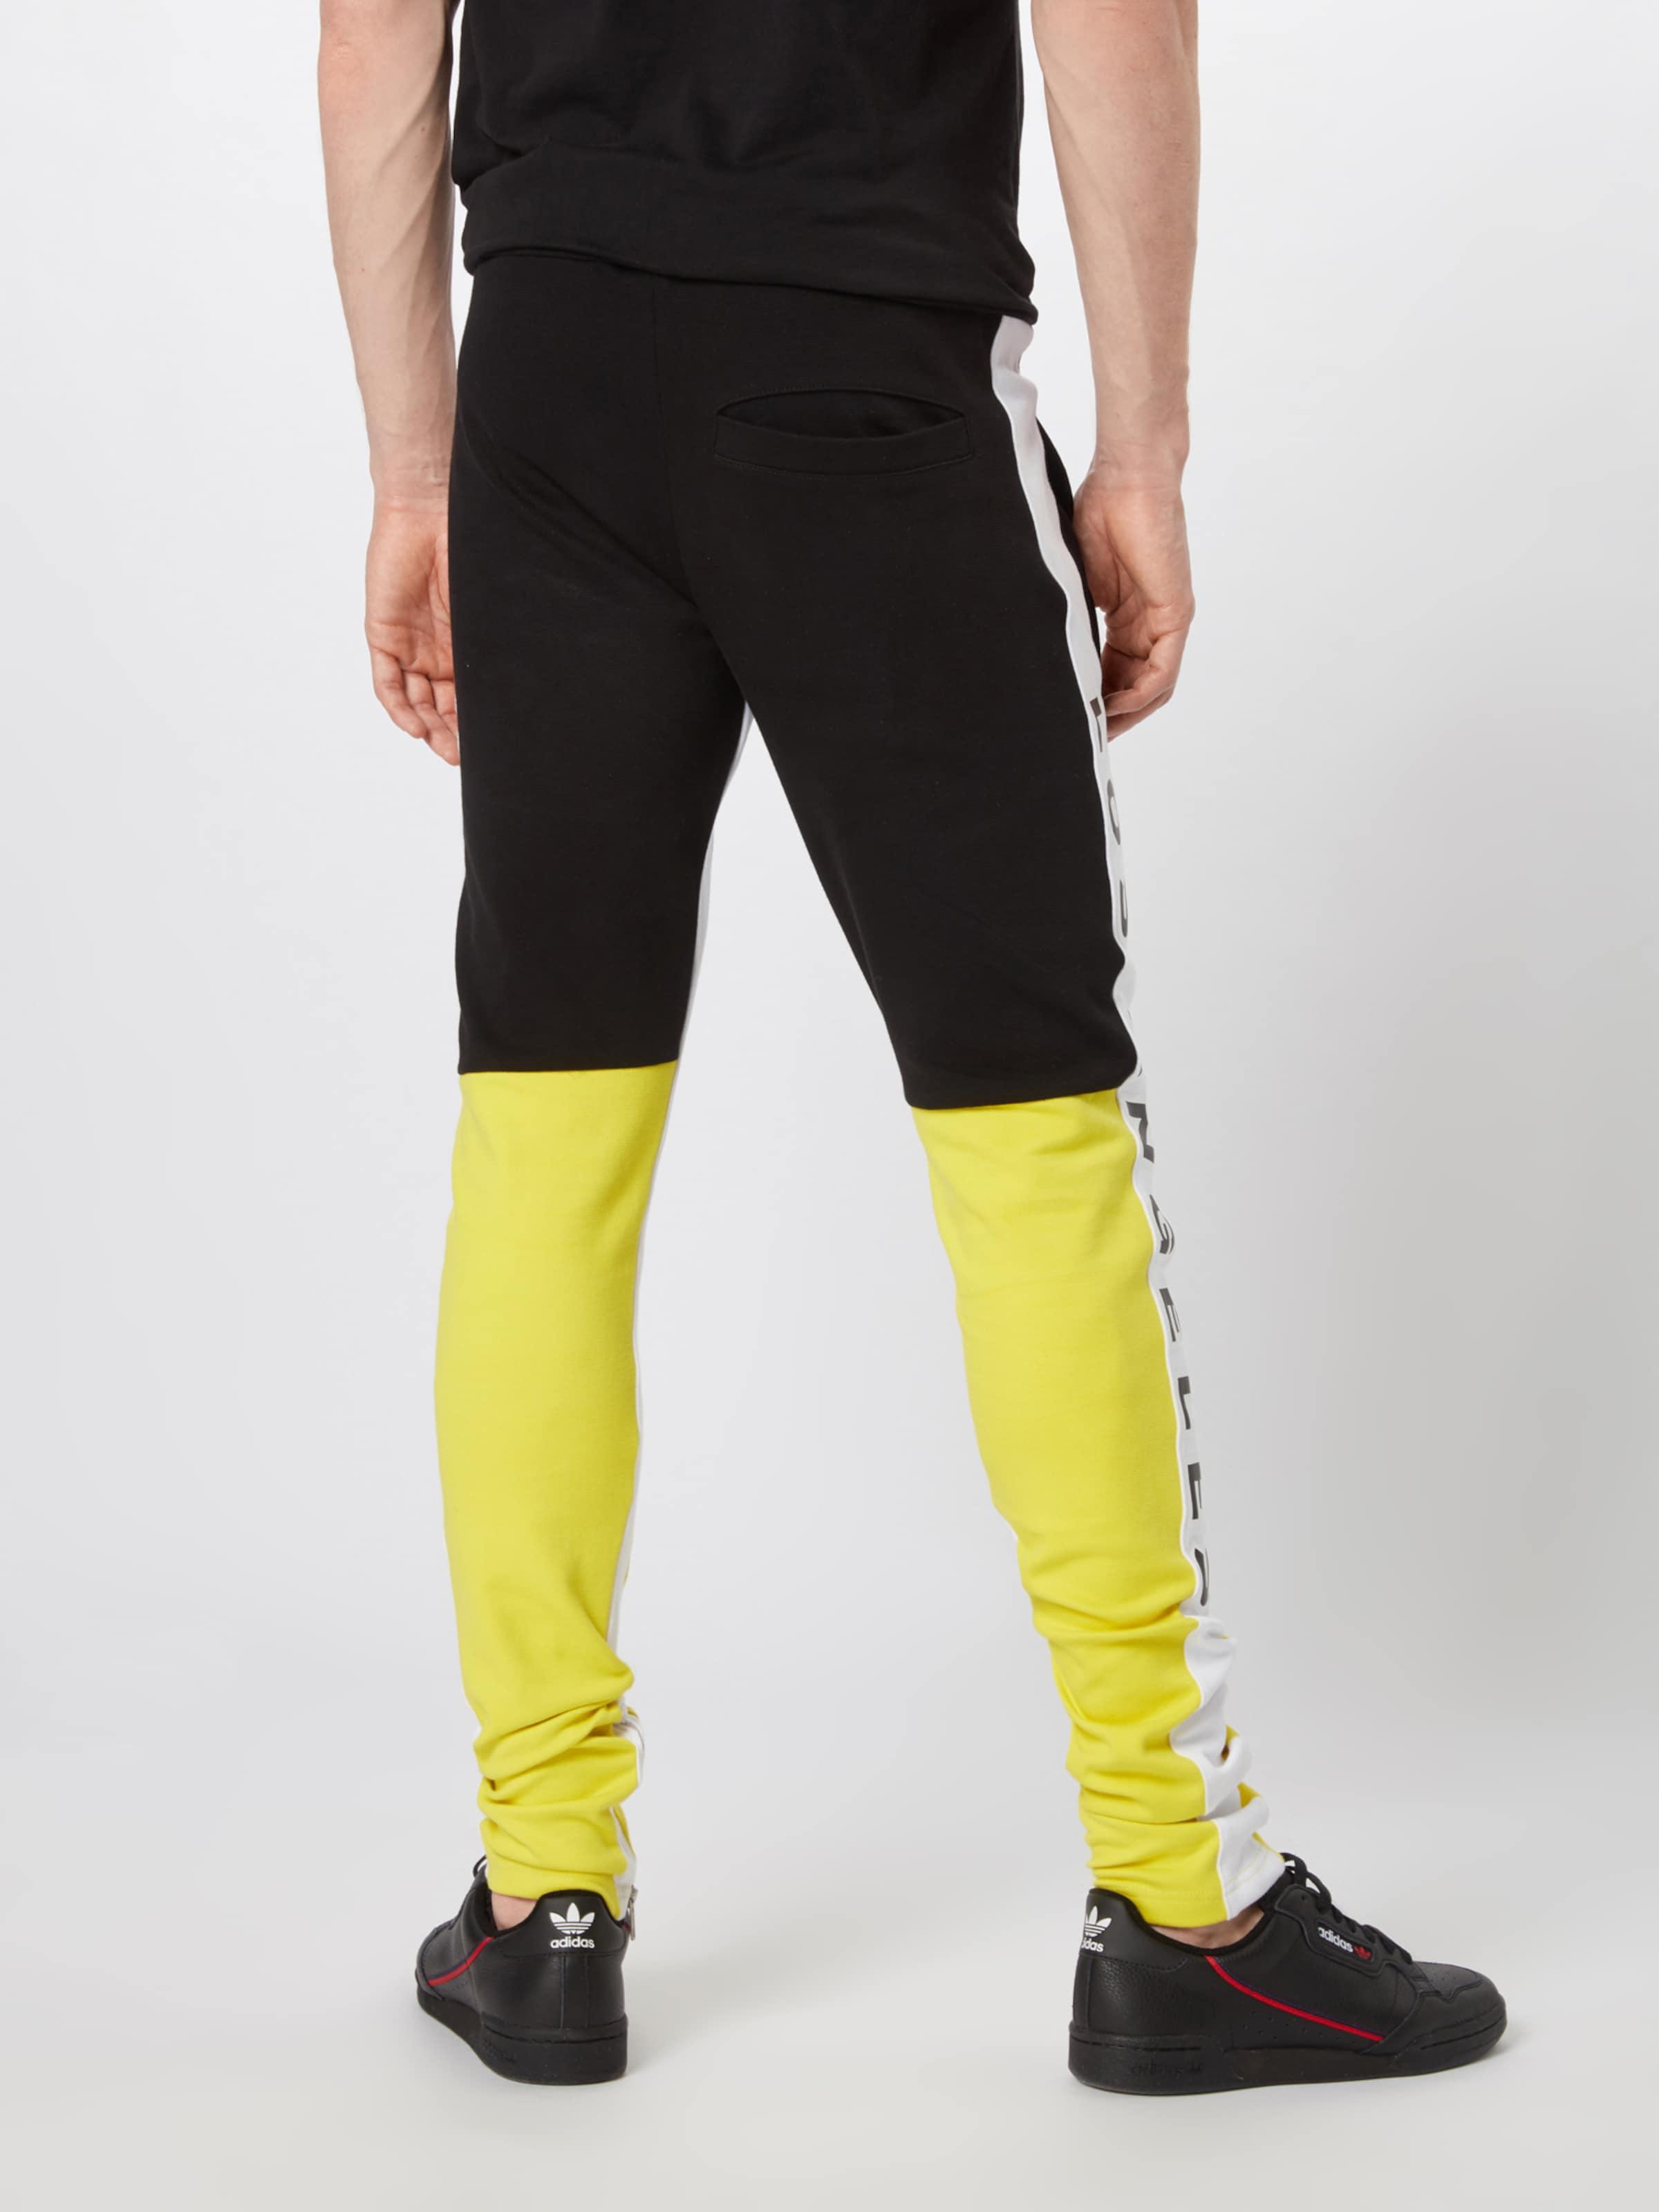 Angeles Blanc Pantalon En Mdla' MagdeburgLos 'track Pants JauneNoir qzUVpSGM